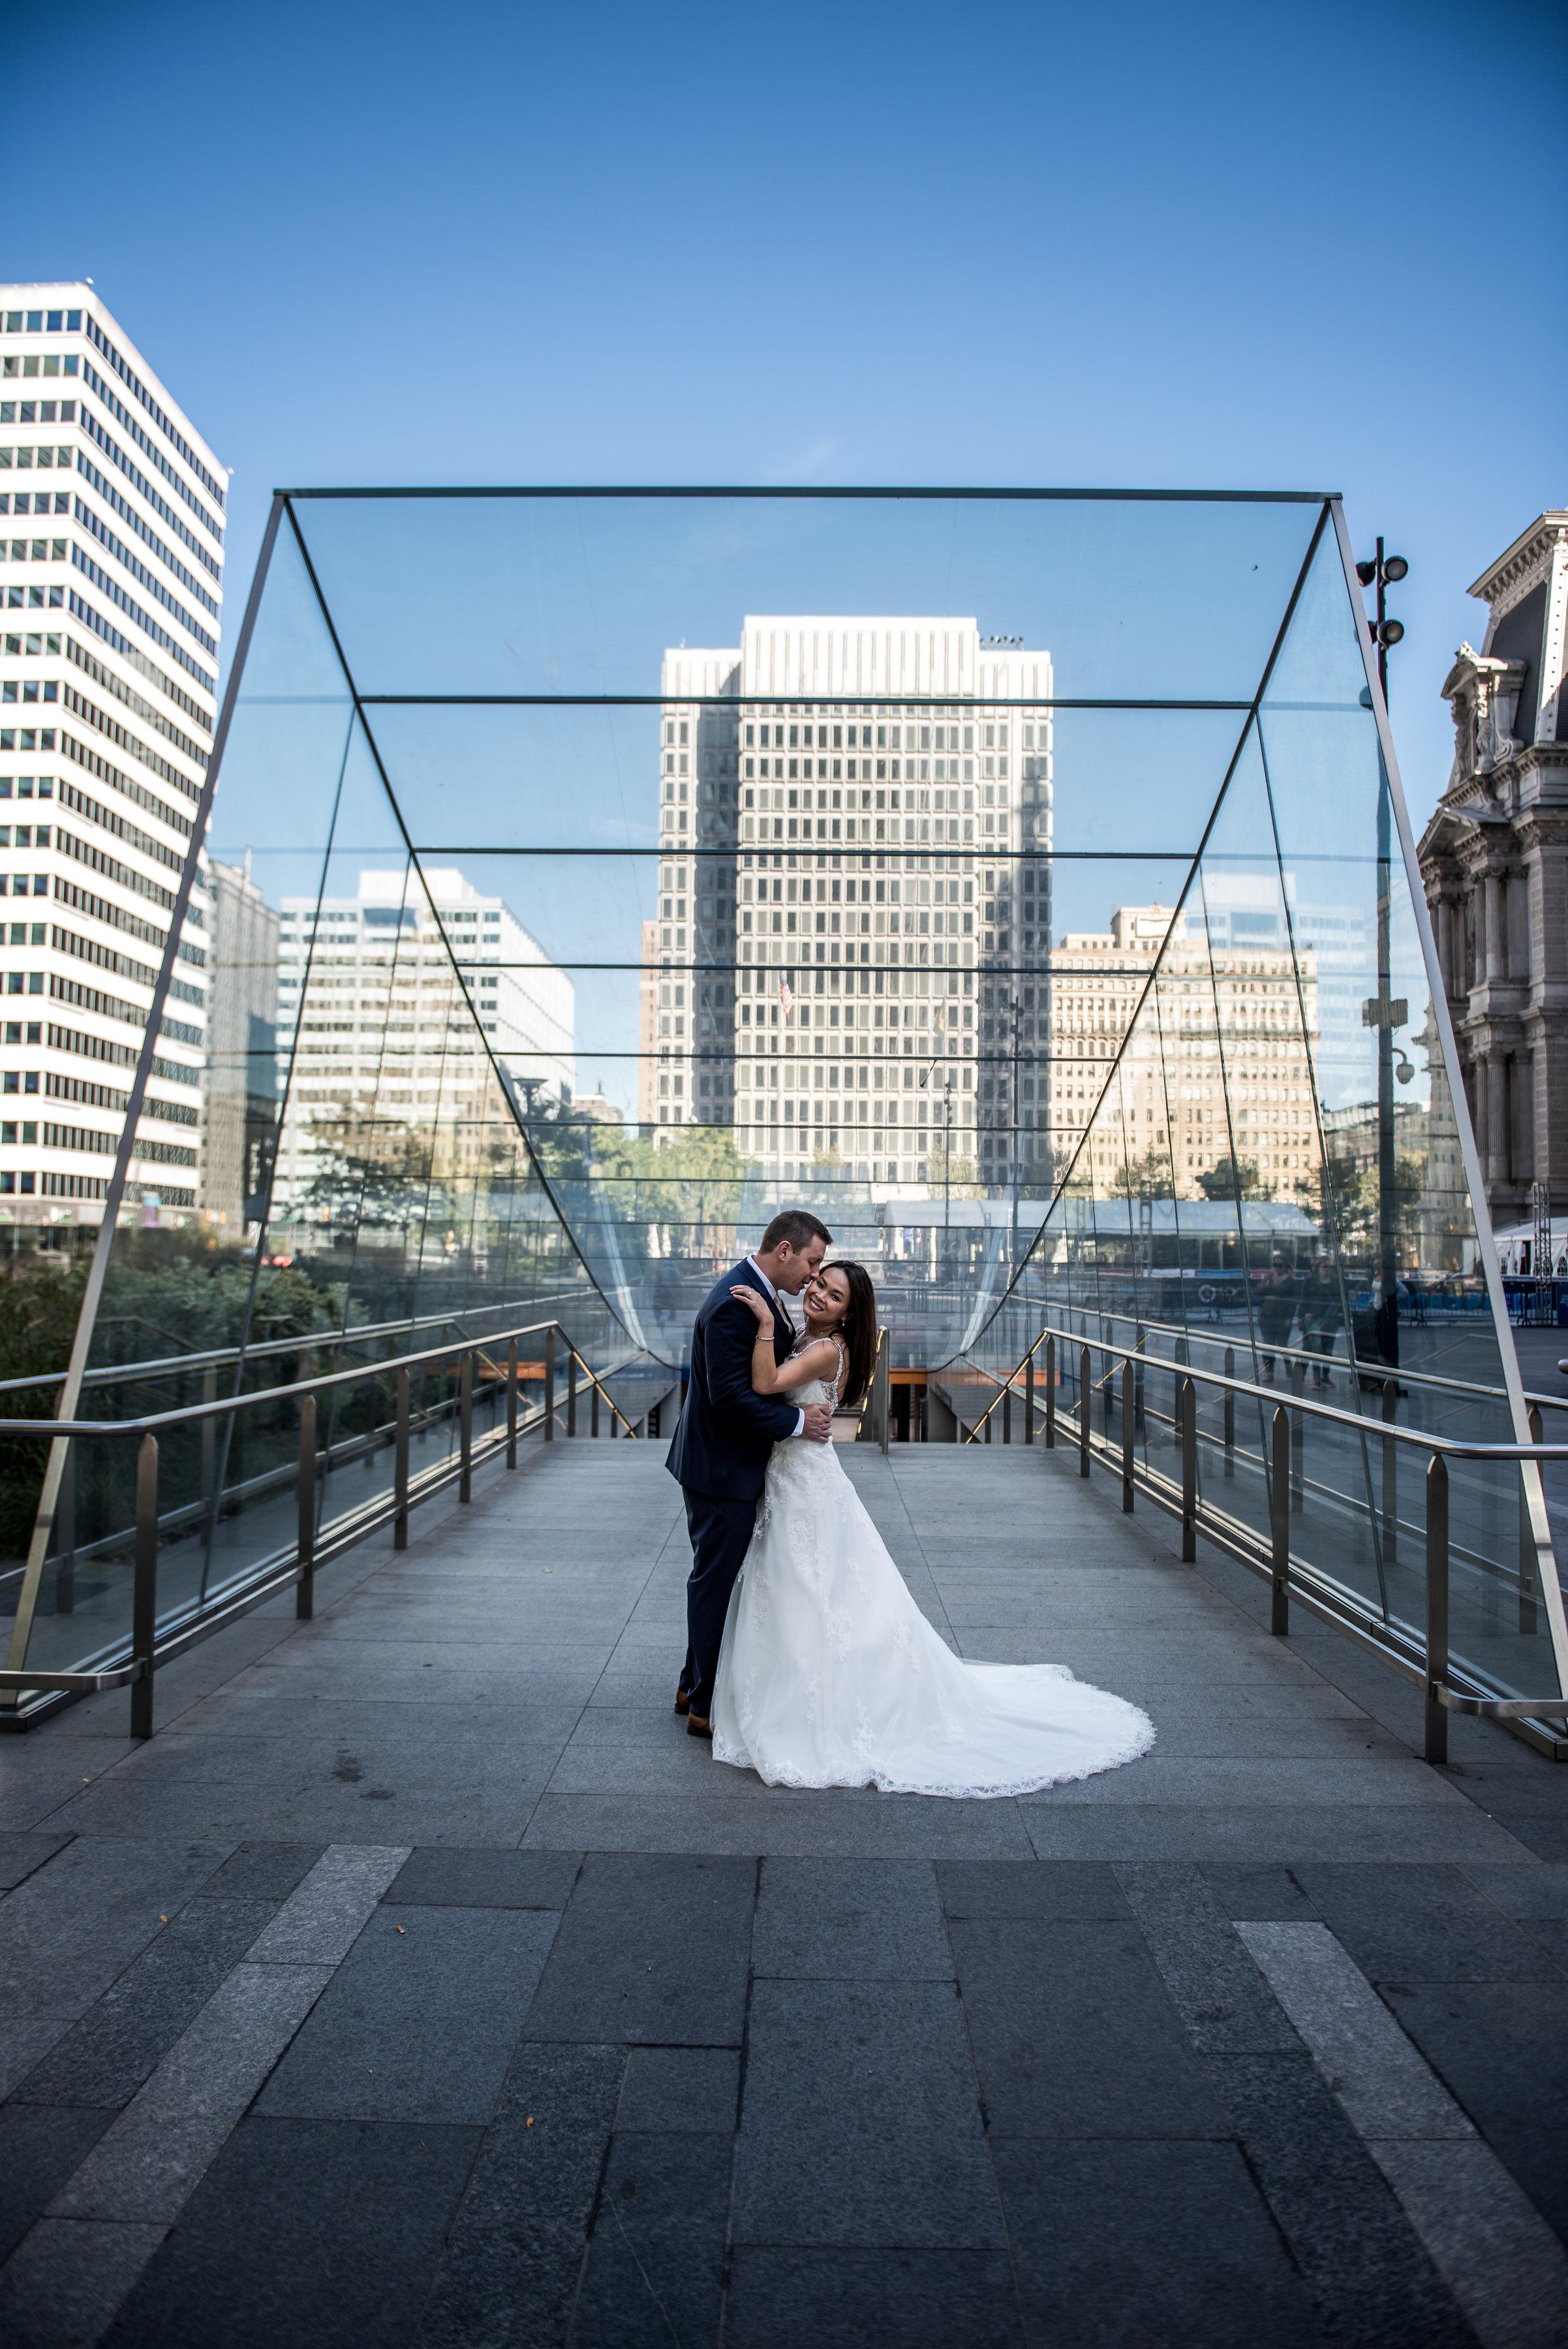 dilworth-park-wedding-photo